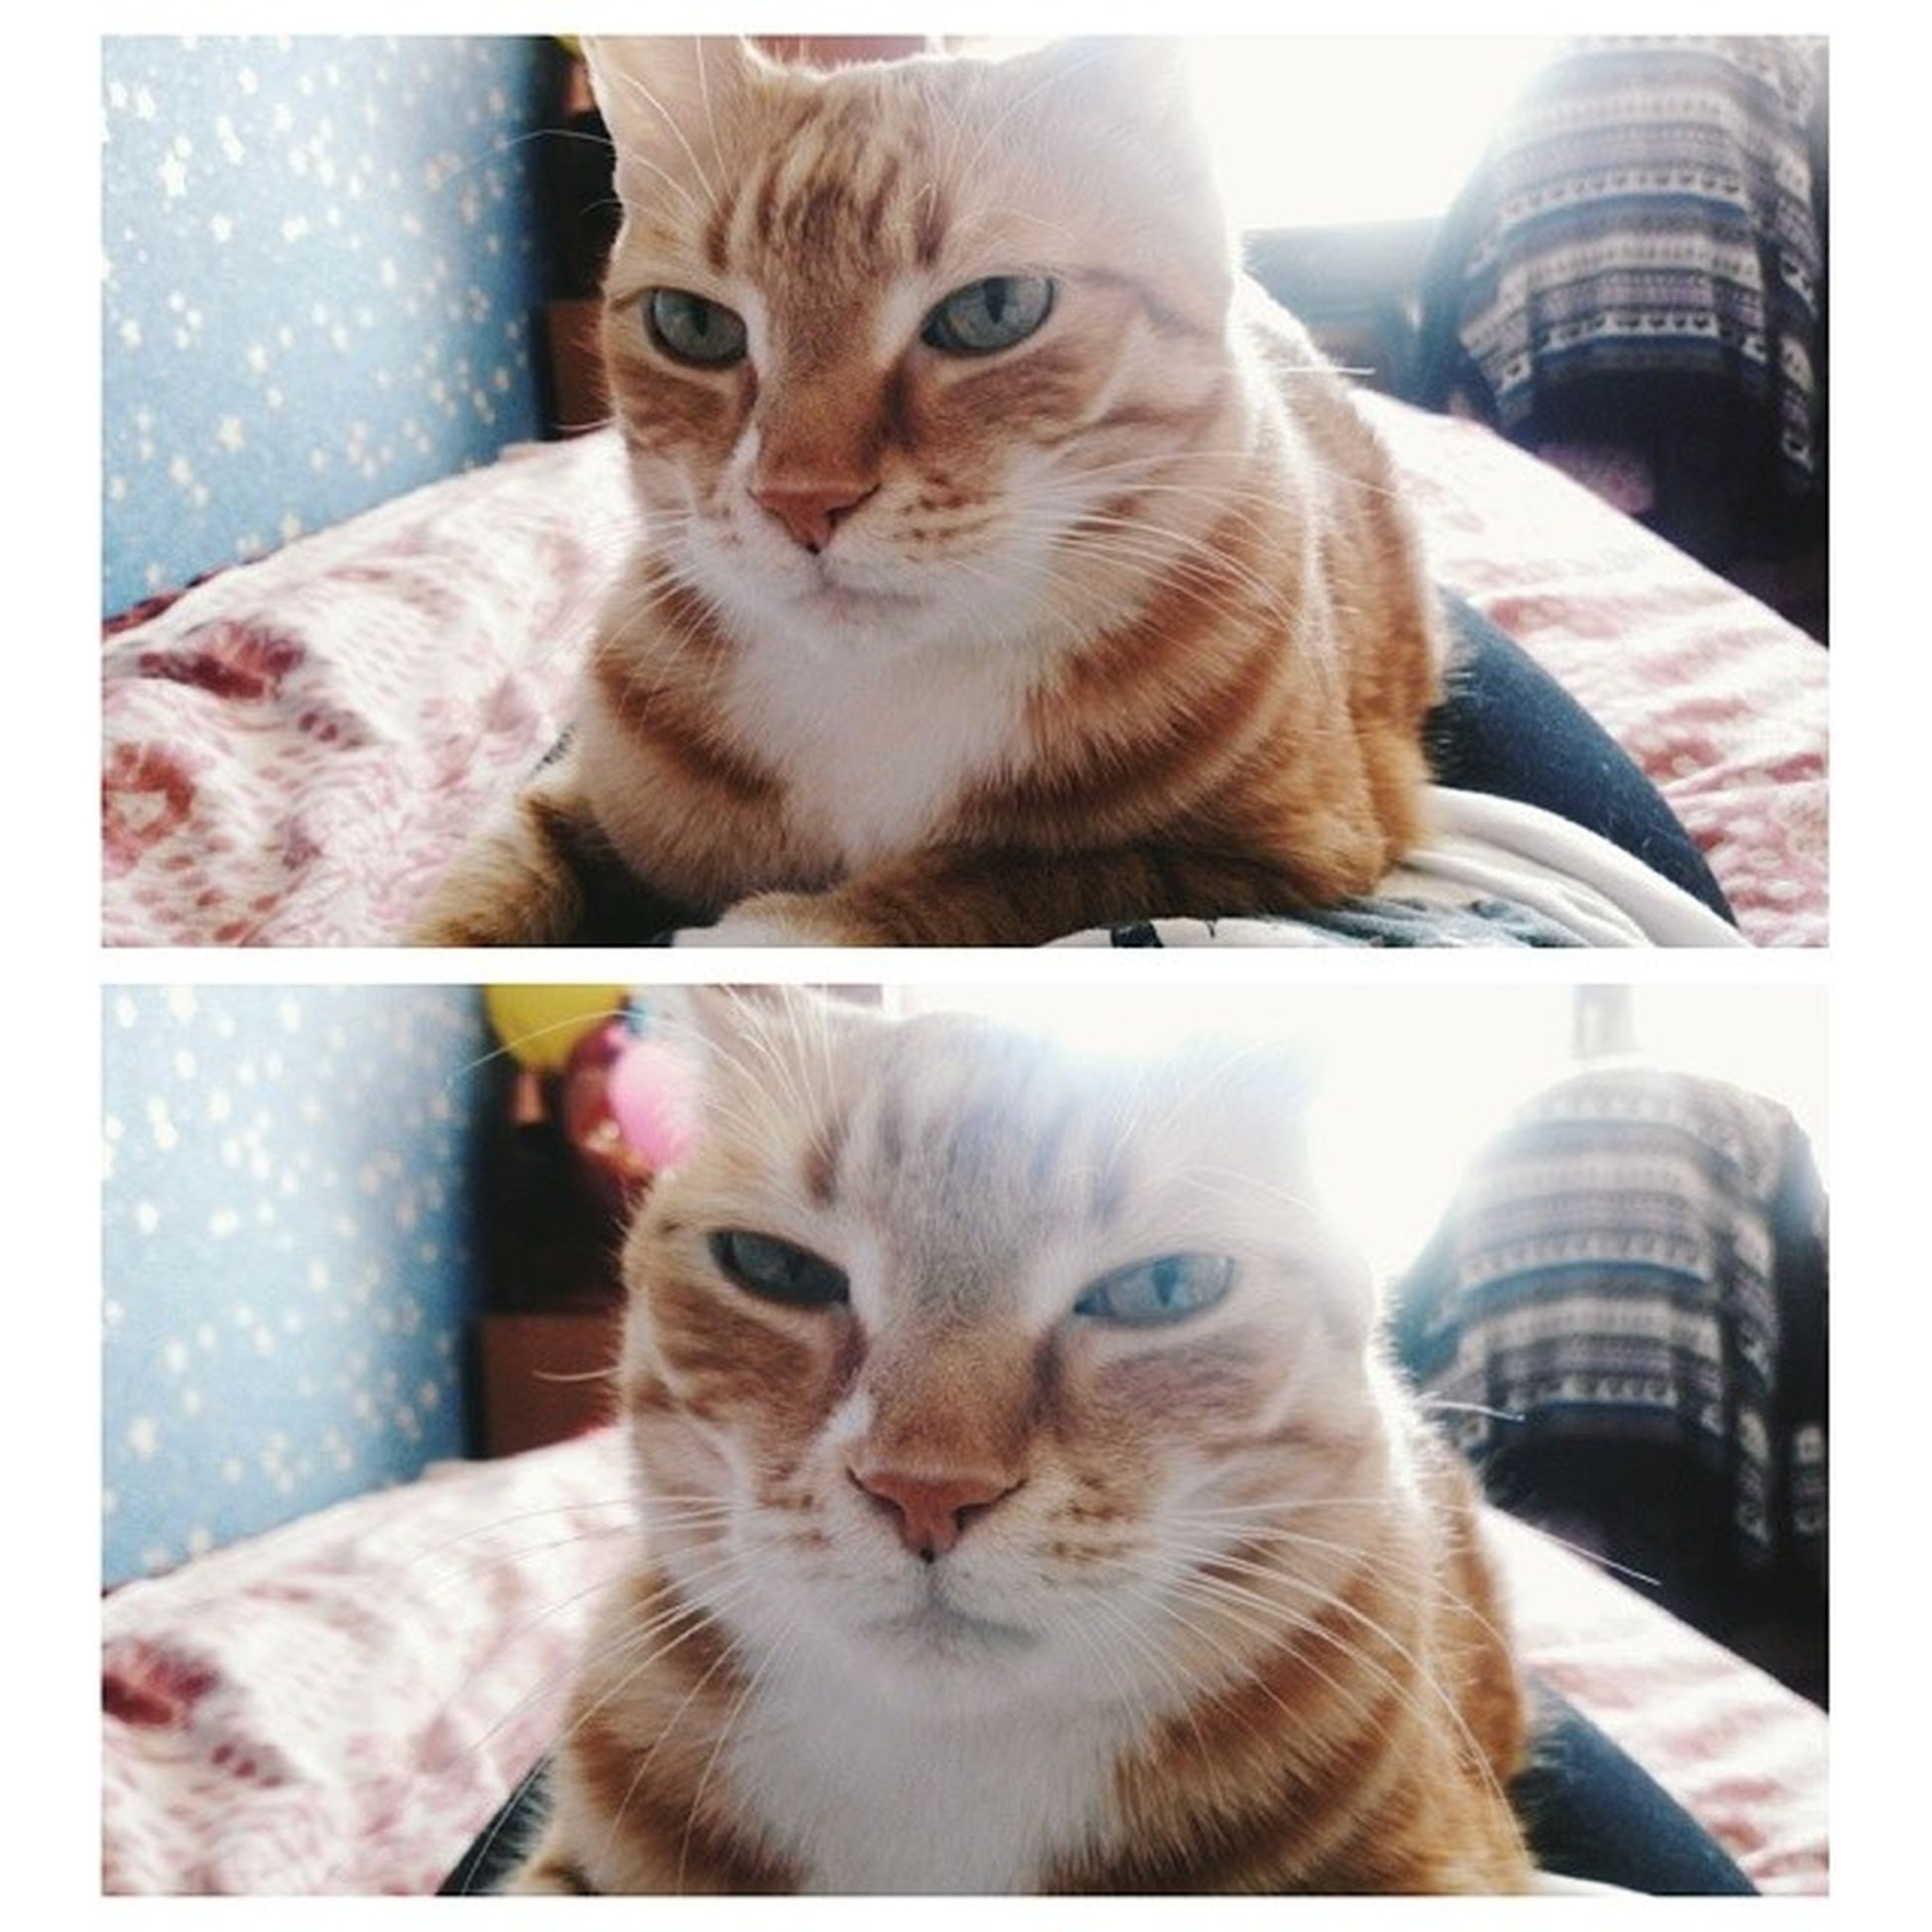 Mrrr? Cat Animals Vcsopop Vscocam vscogood vscoshout vscorussia vsco LOL love любимка котэ